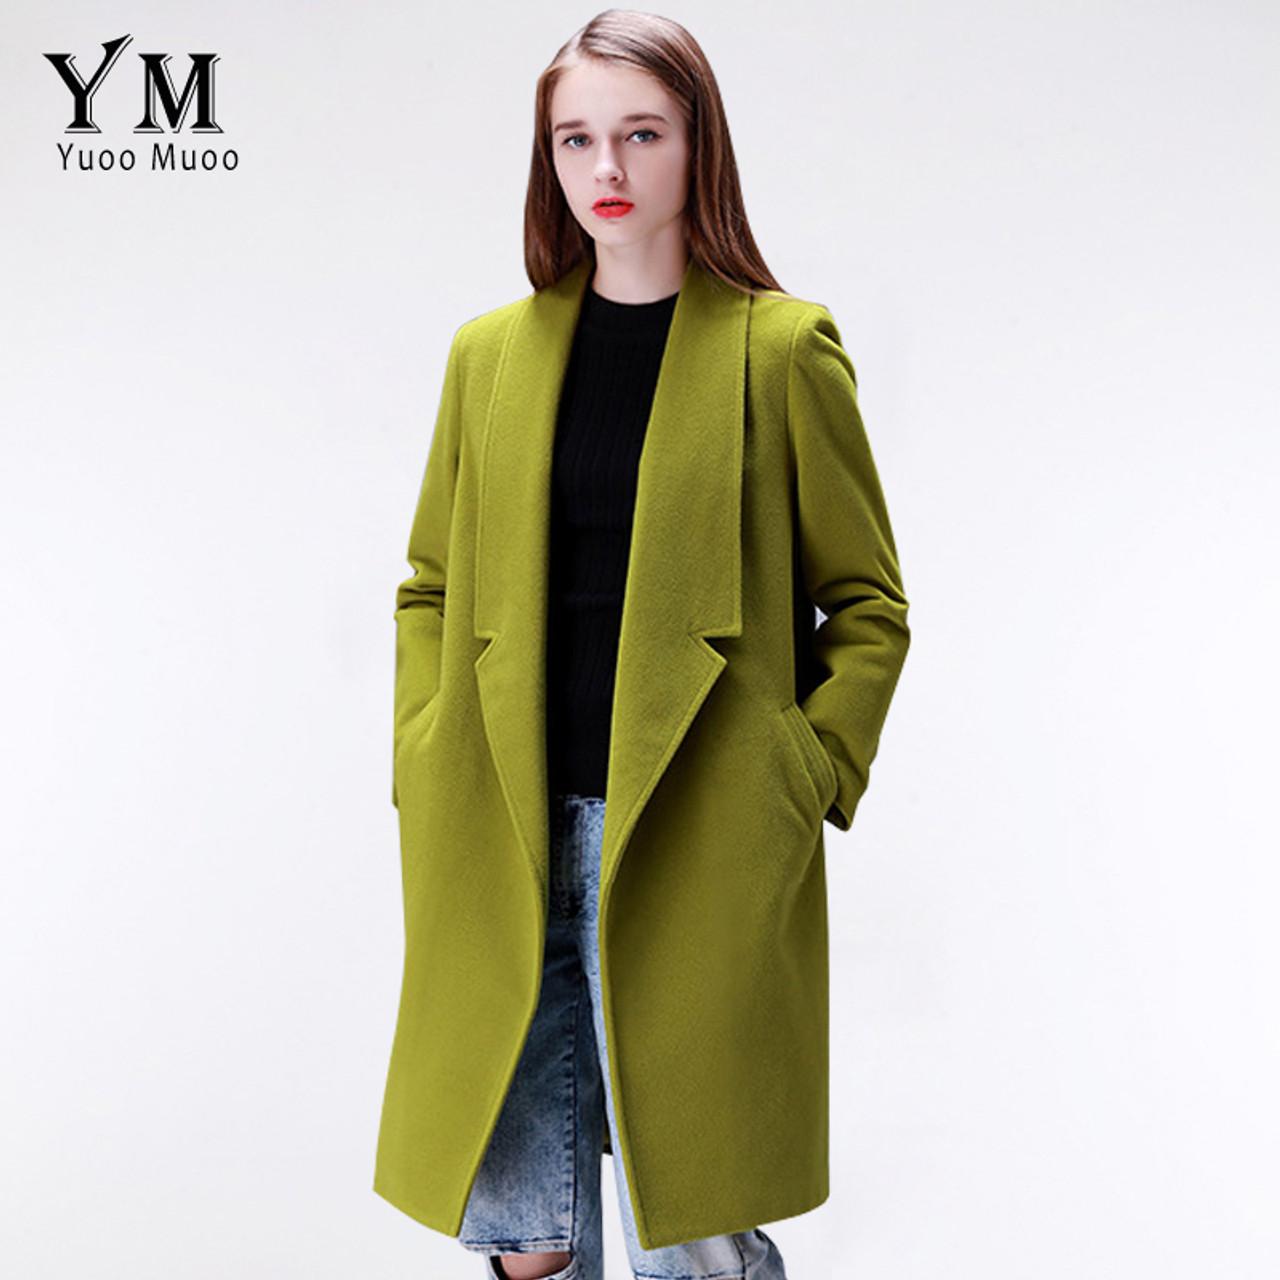 9d6b1a41d ... YuooMuoo Brand Design Winter Coat Women Warm Cotton-padded Wool Coat  Long Women s Cashmere Coat ...